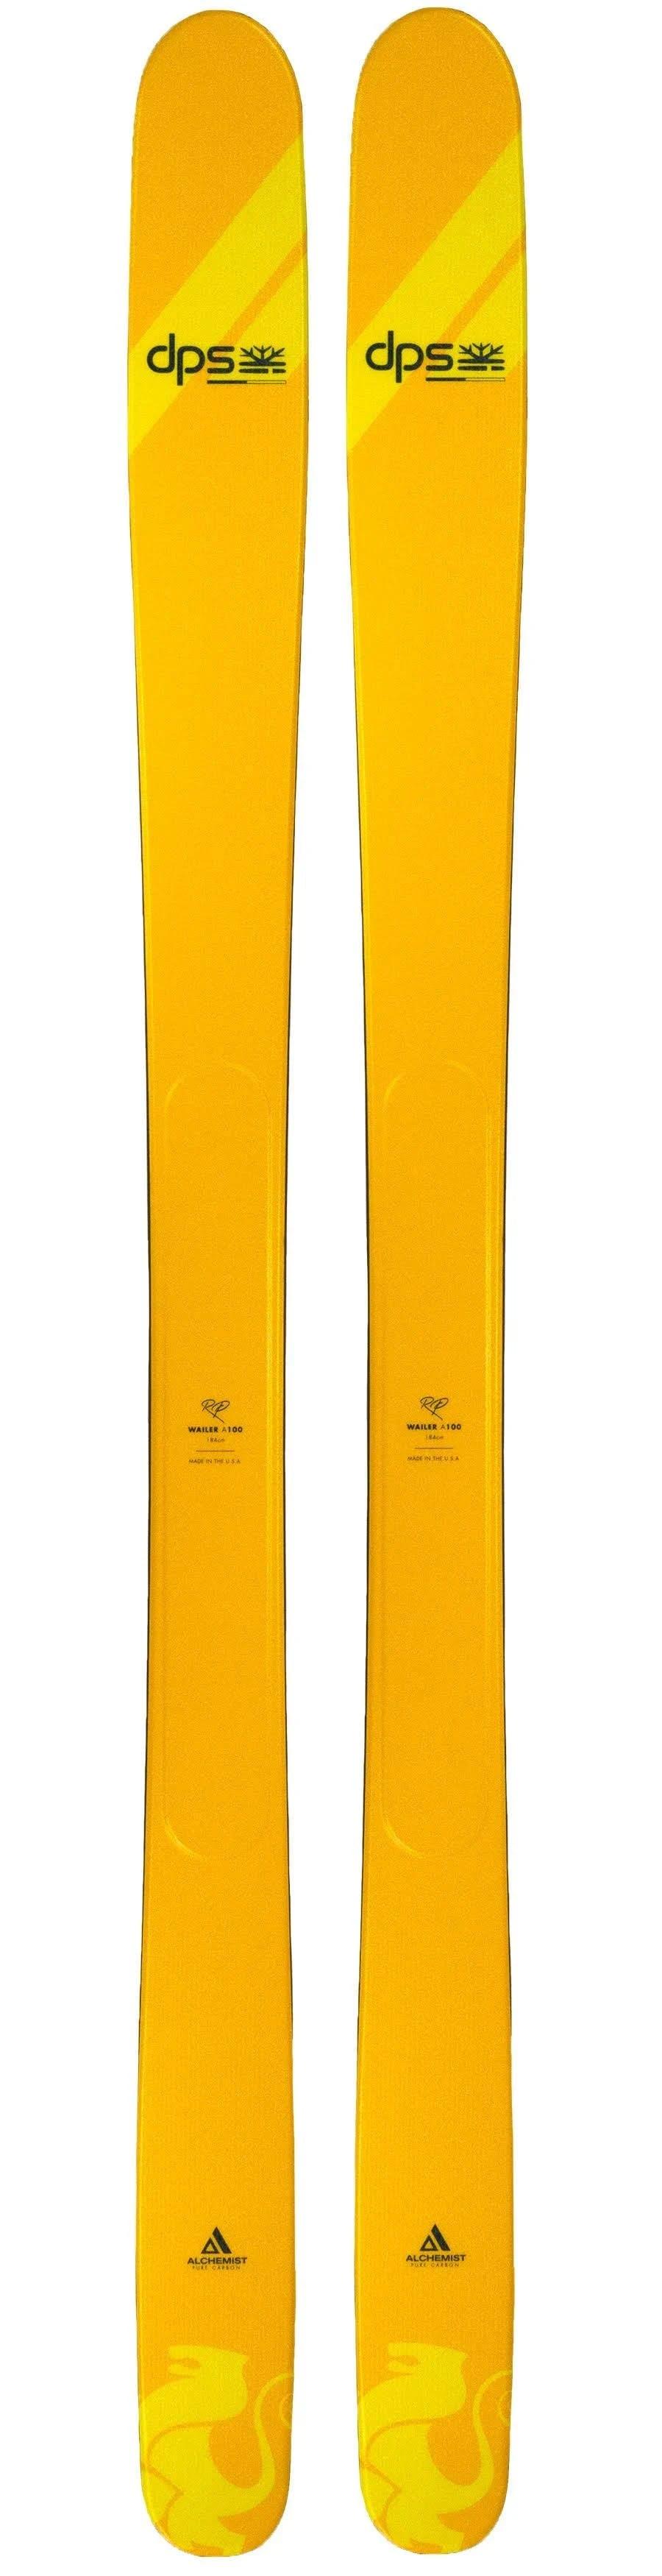 DPS Alchemist Wailer 100 RP Skis